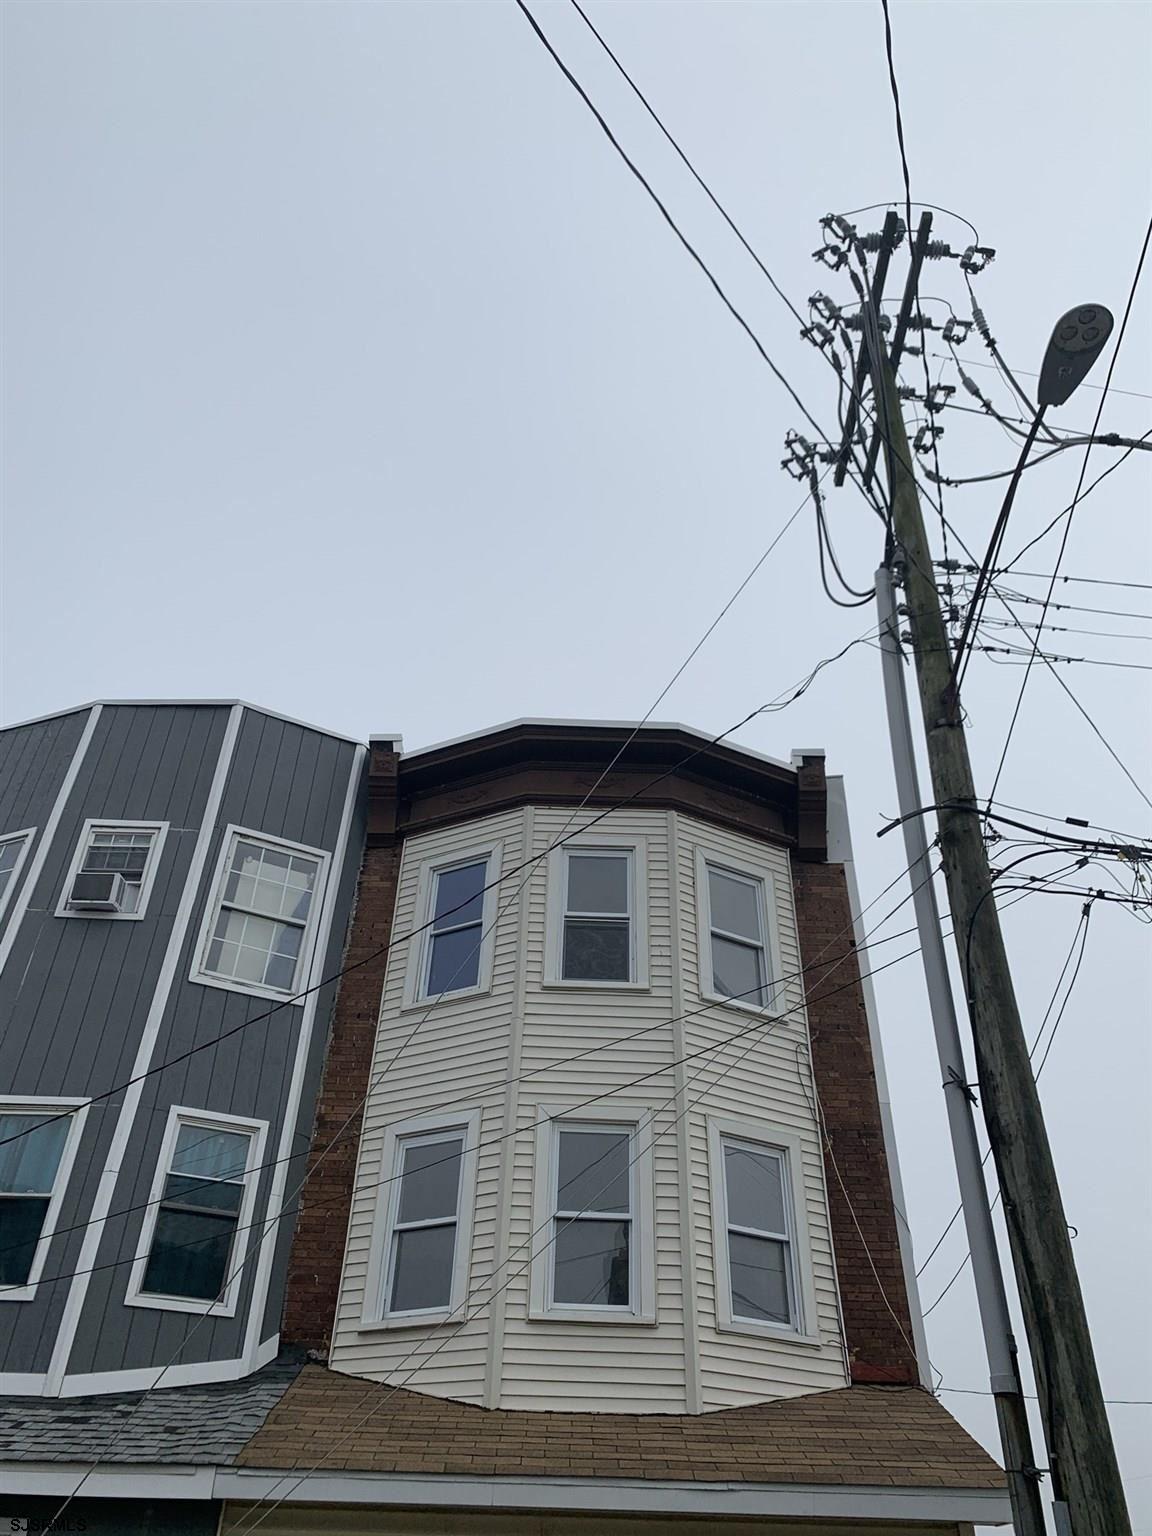 1110 Baltic Ave Ave, Atlantic City, NJ 08401 - #: 549216